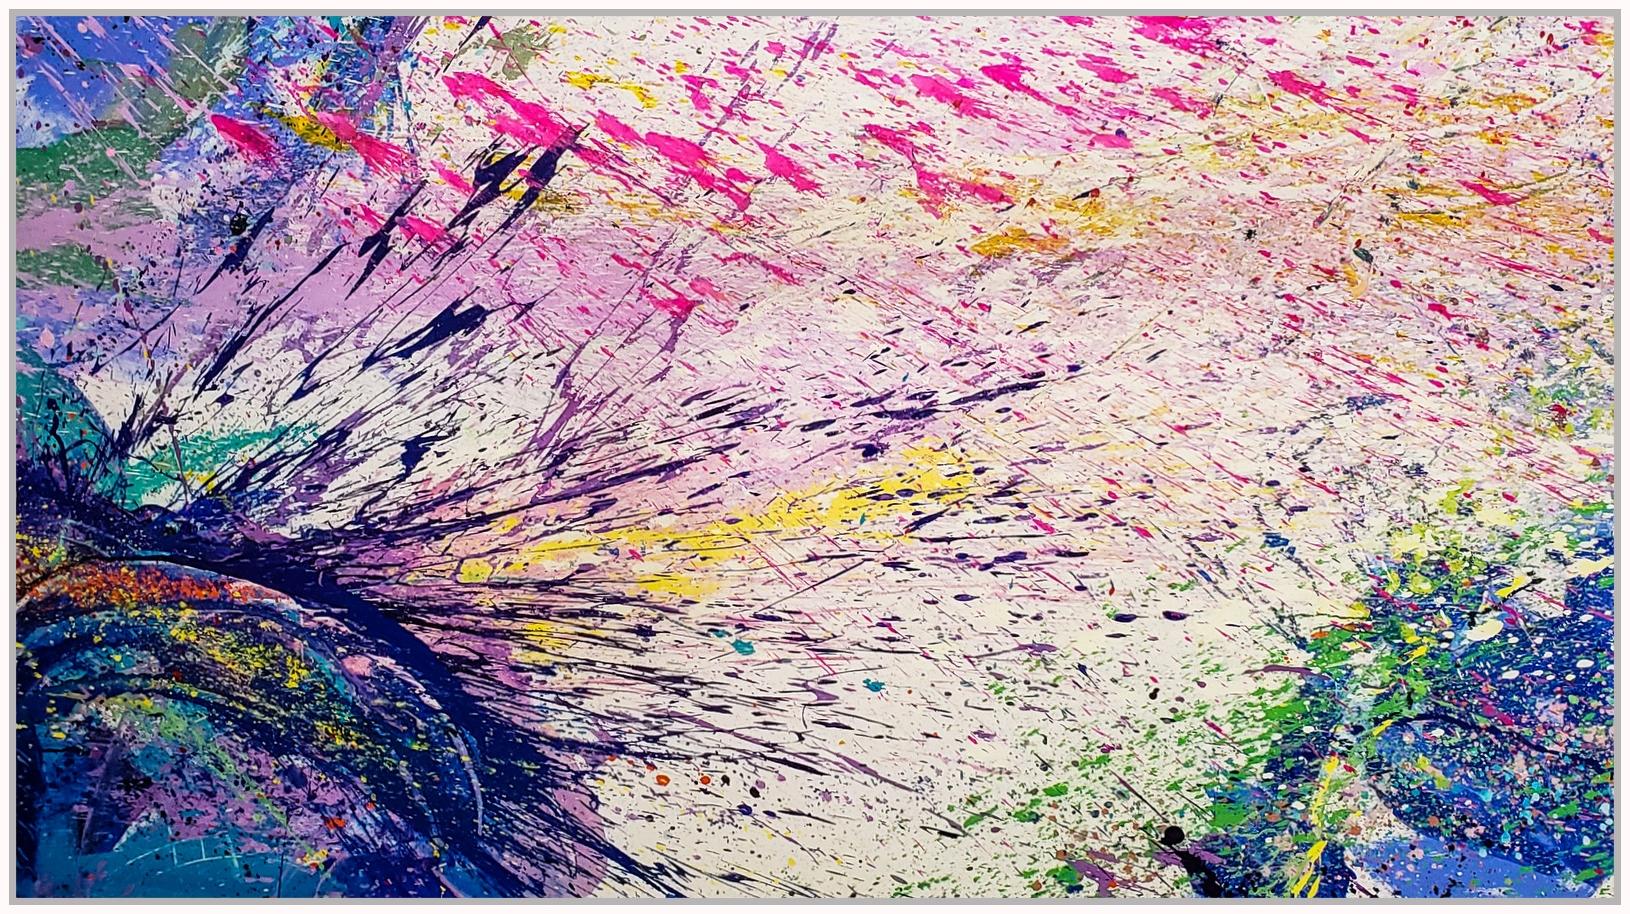 "Napa Valley #82, 2019, acrylic on canvas, 60"" x 108"" (152.4 x 274 cm)"